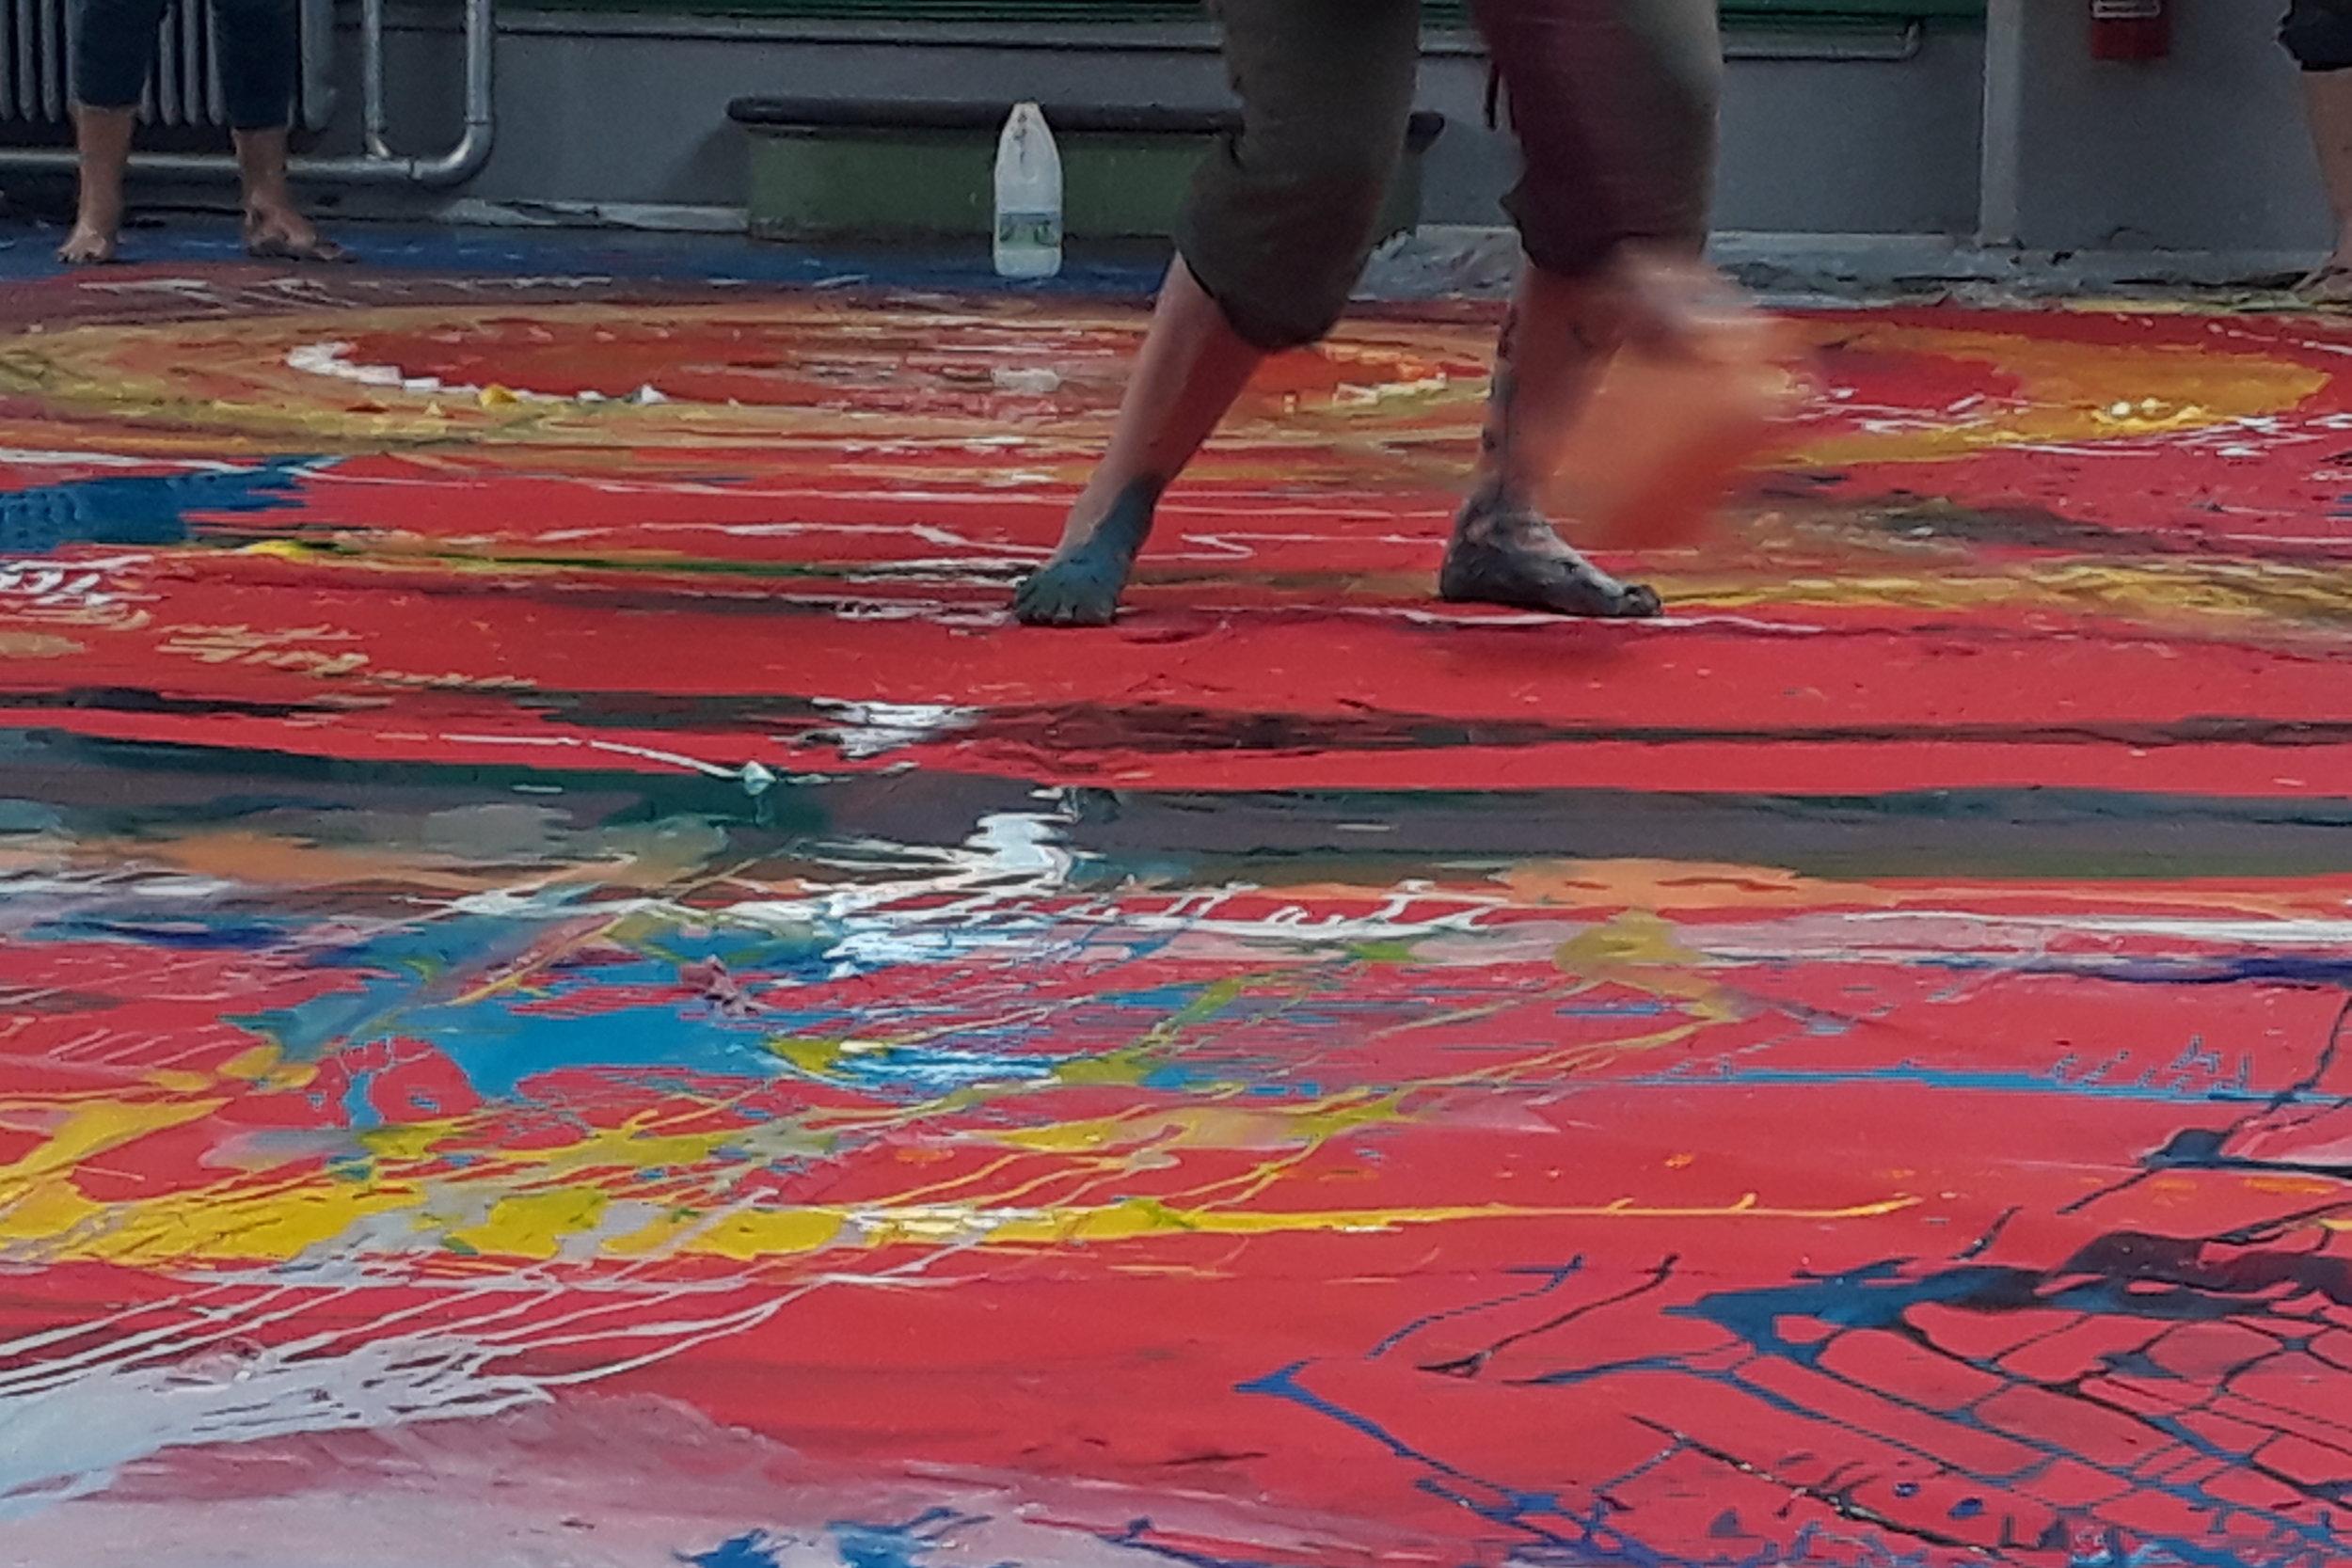 Painting score.jpg